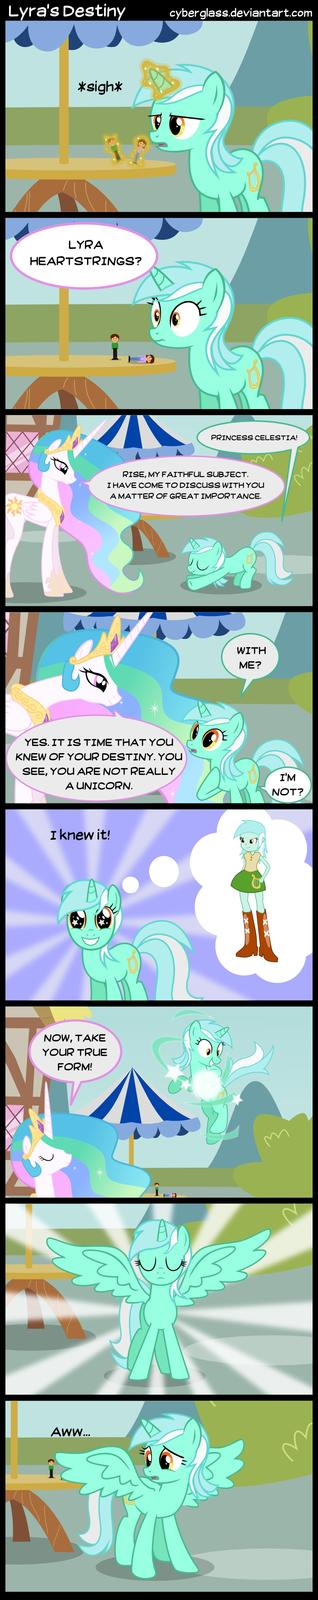 Lyra's Destiny